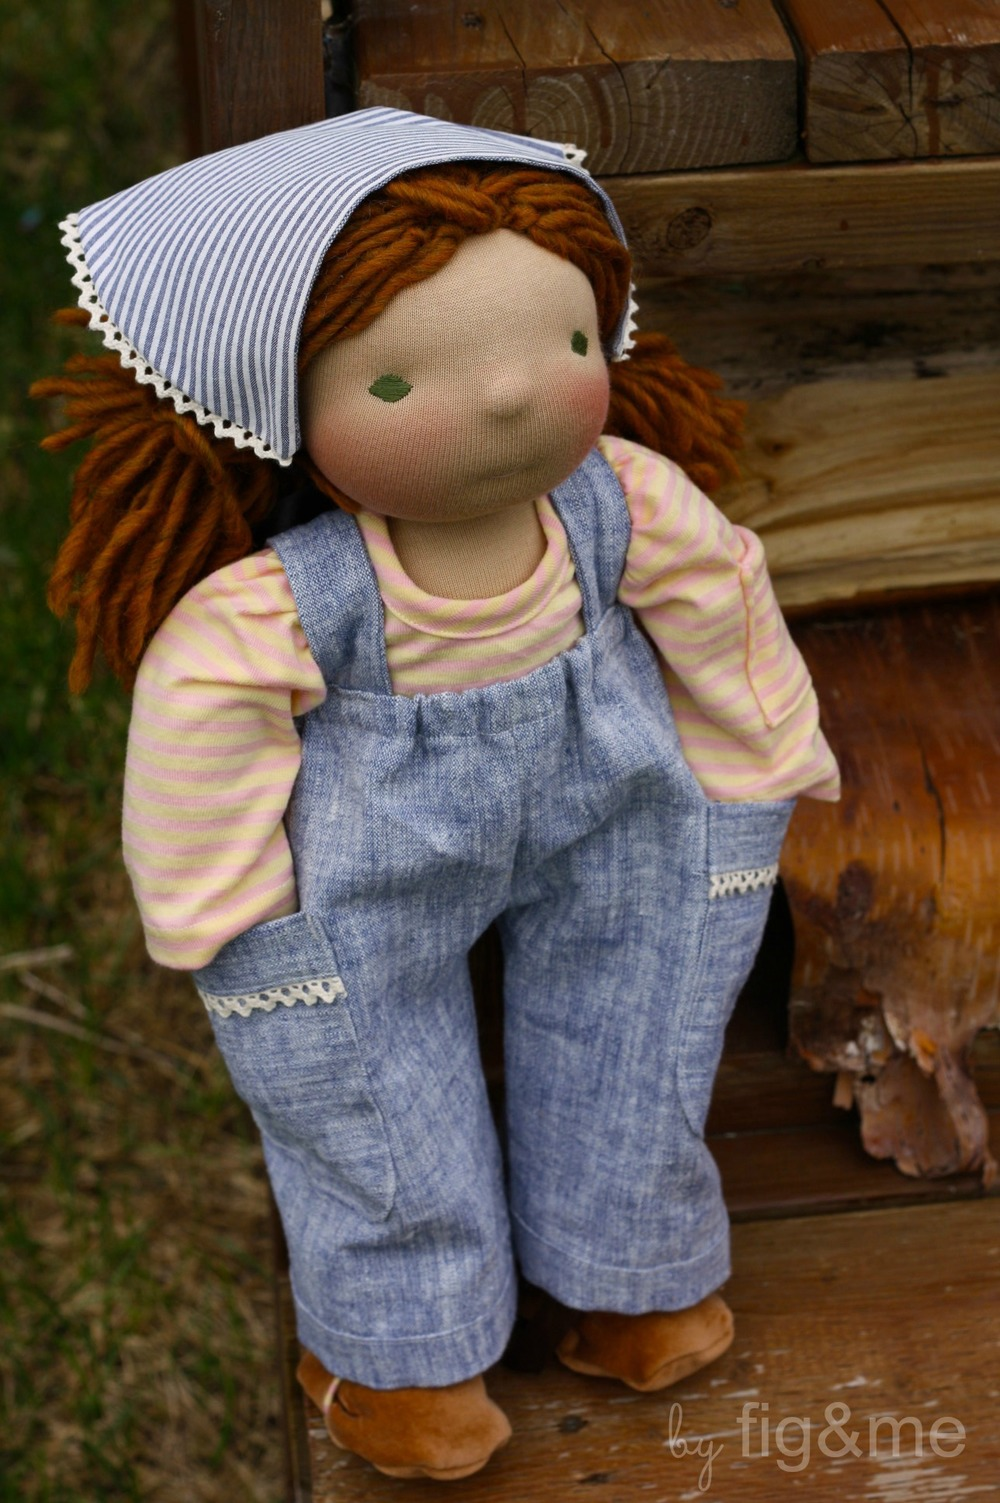 Penelope-overalls-figandme.jpg